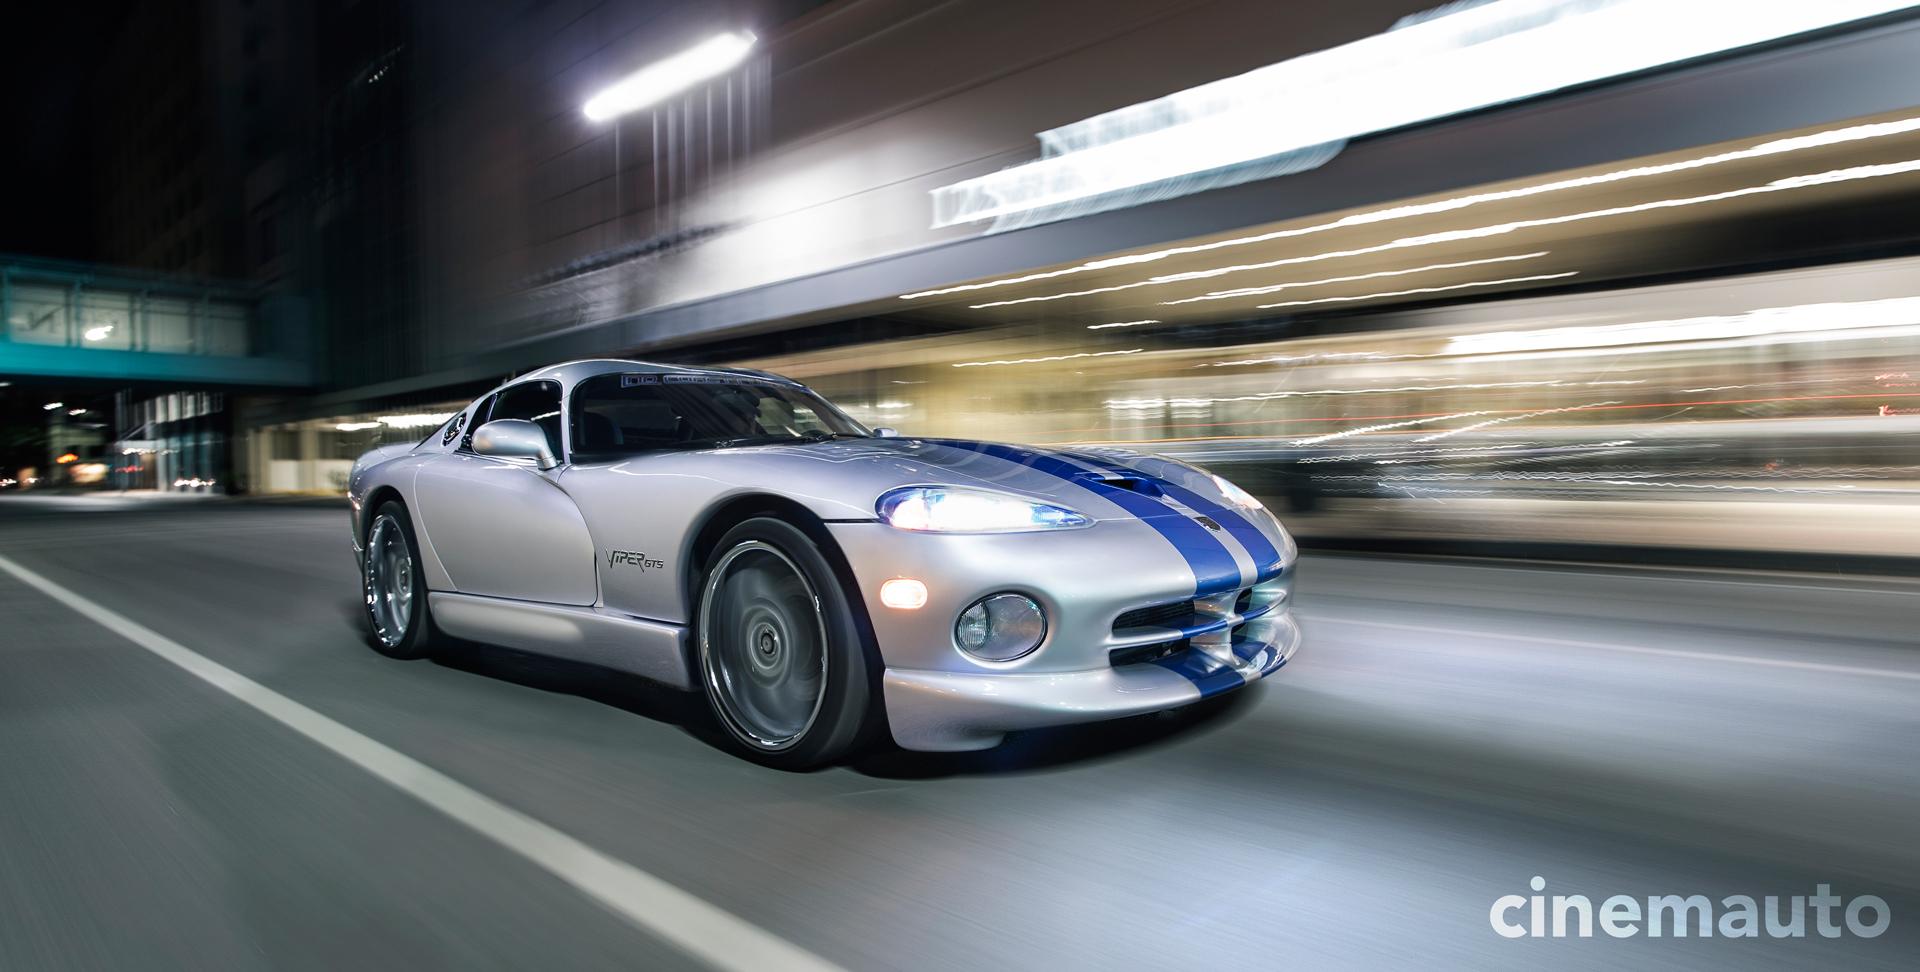 cinemauto-wichita-autmotive-photography-midwest-car-photography-ah.jpg